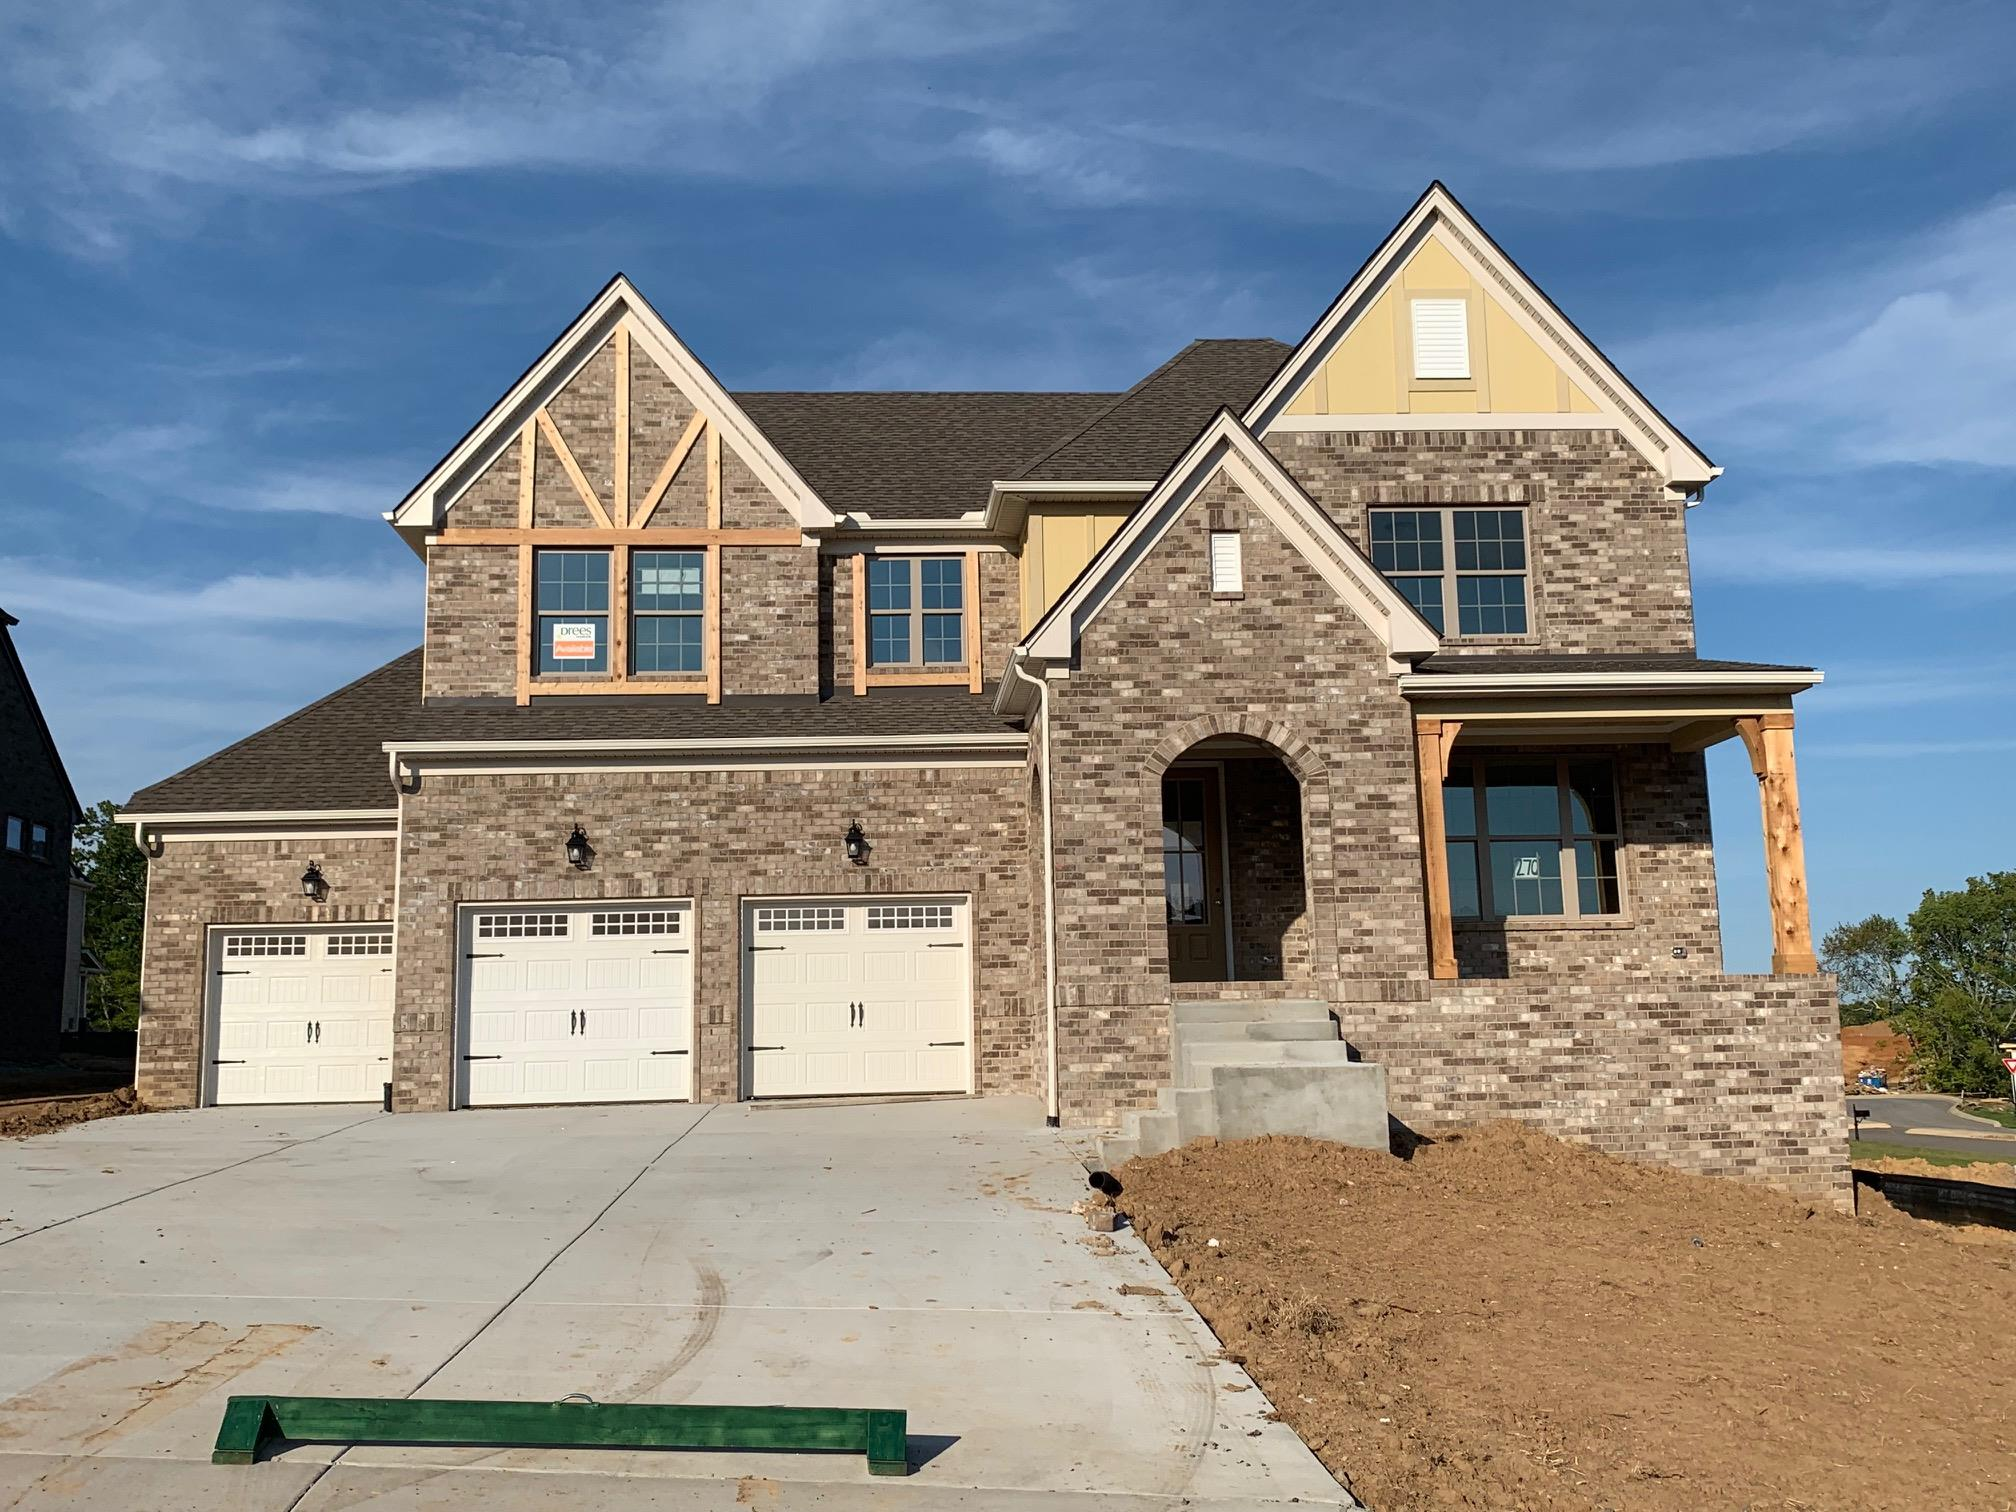 702 Rickfield Court #270, Mount Juliet, TN 37122 - Mount Juliet, TN real estate listing